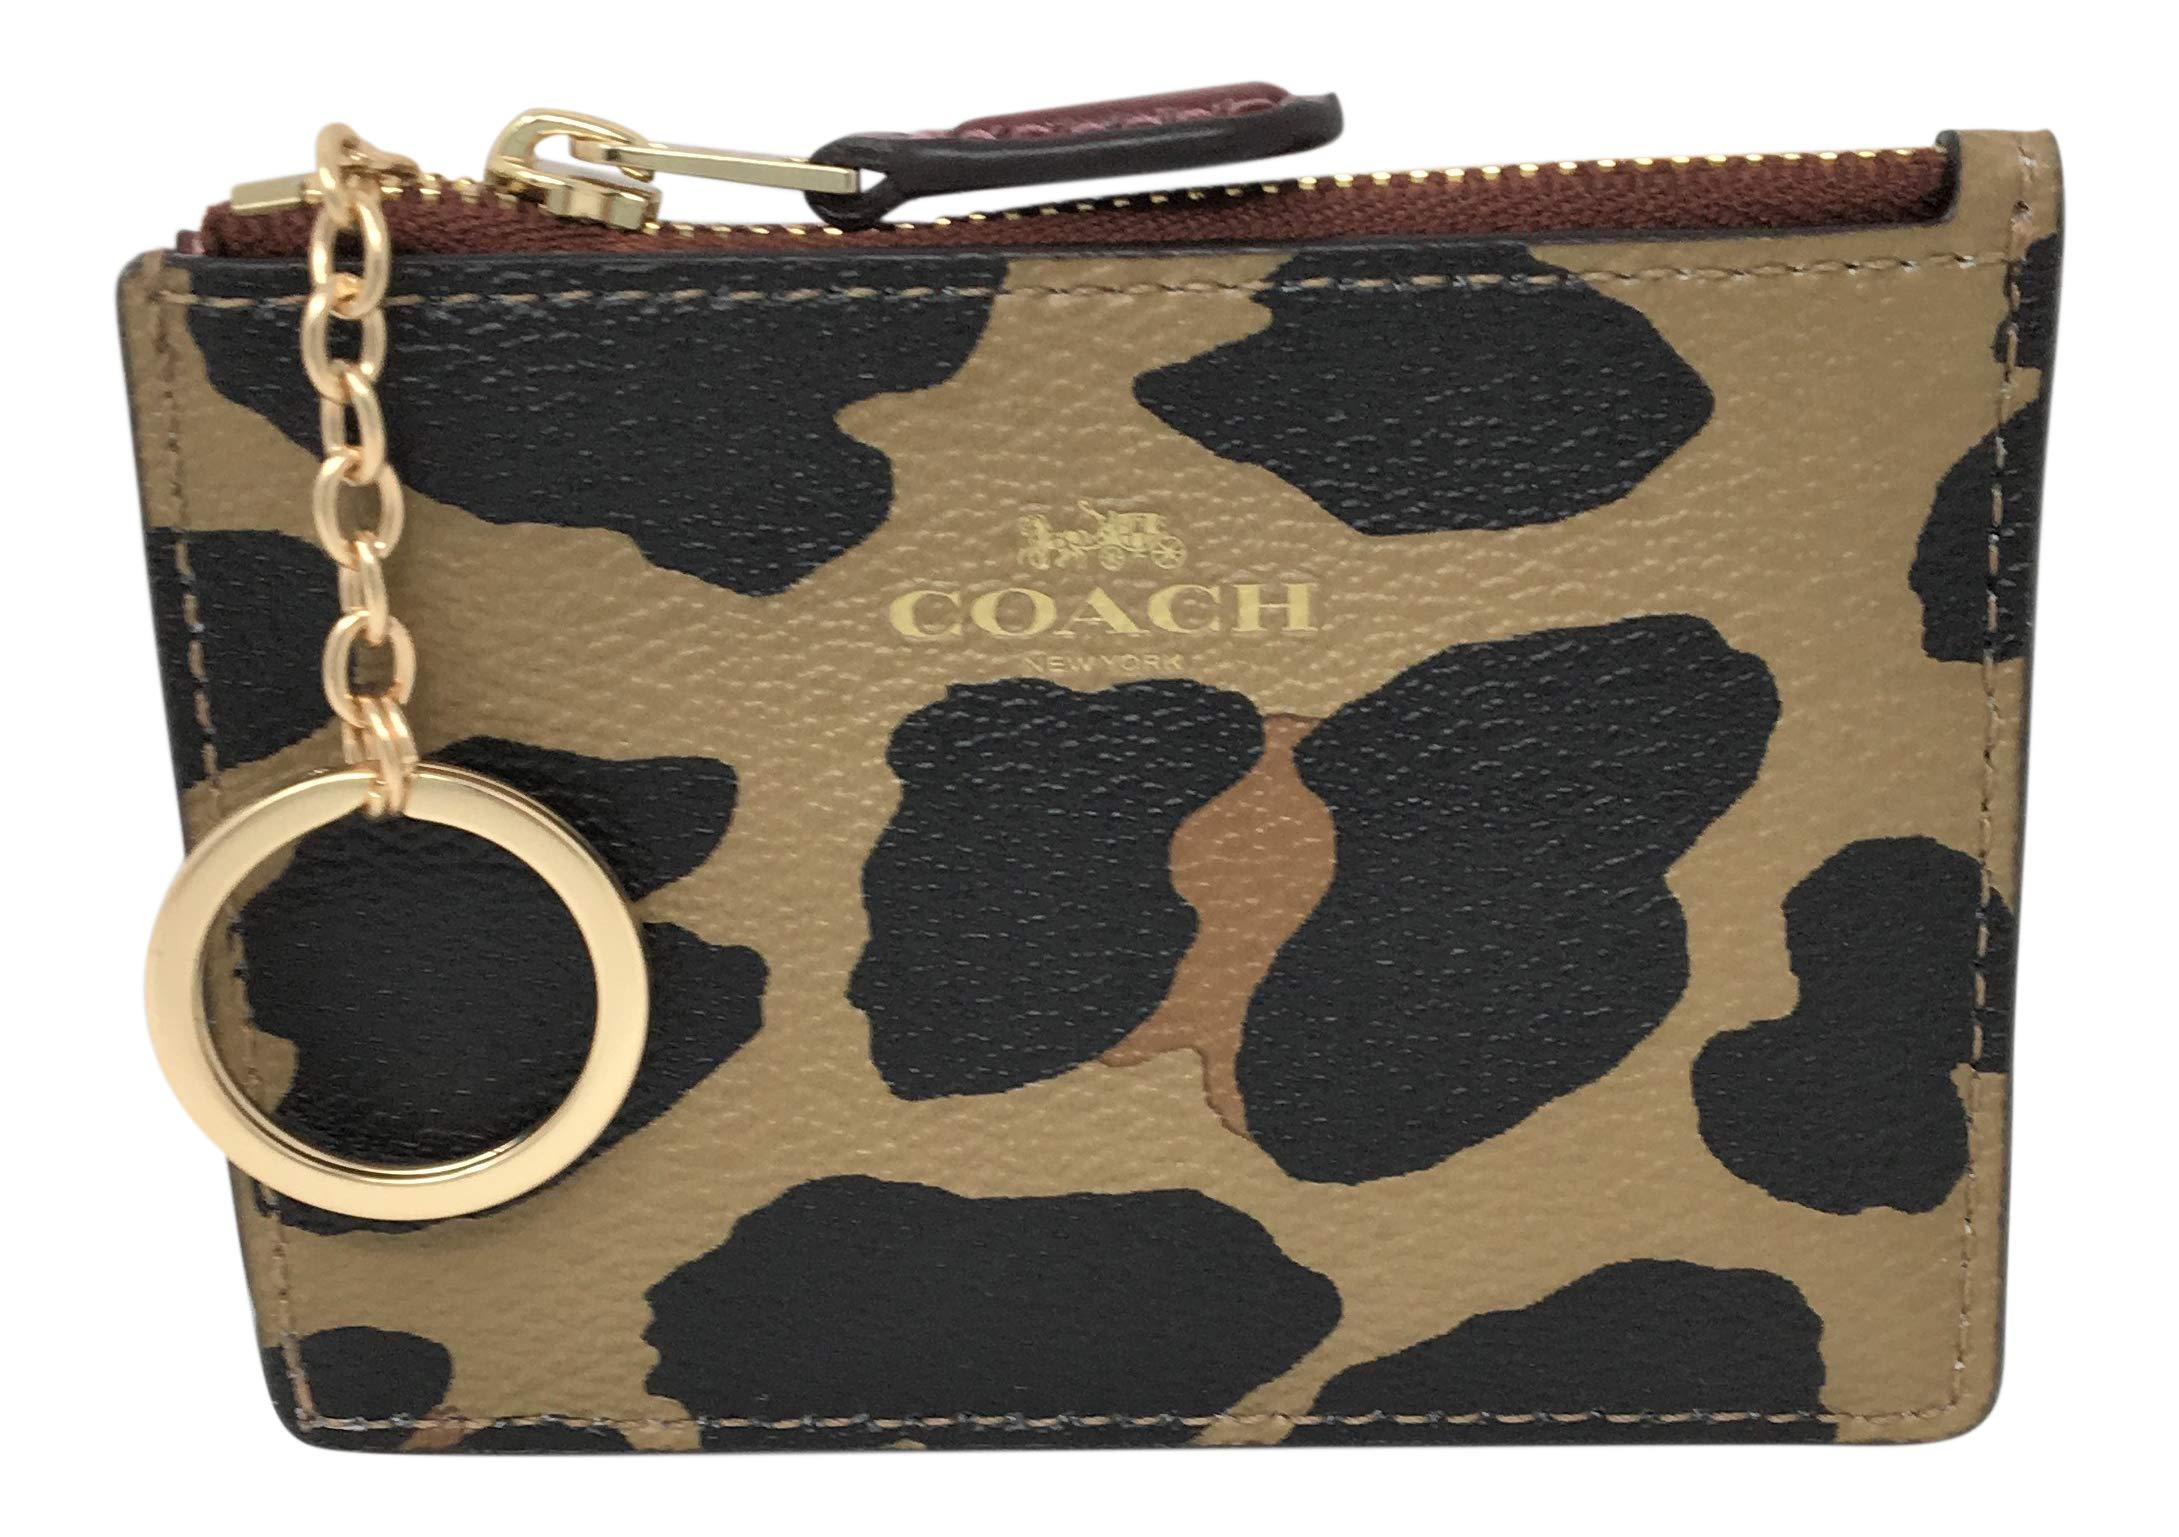 Coach Coated Canvas in Leopard Print Mini Skinny ID Badge Card Case F39081